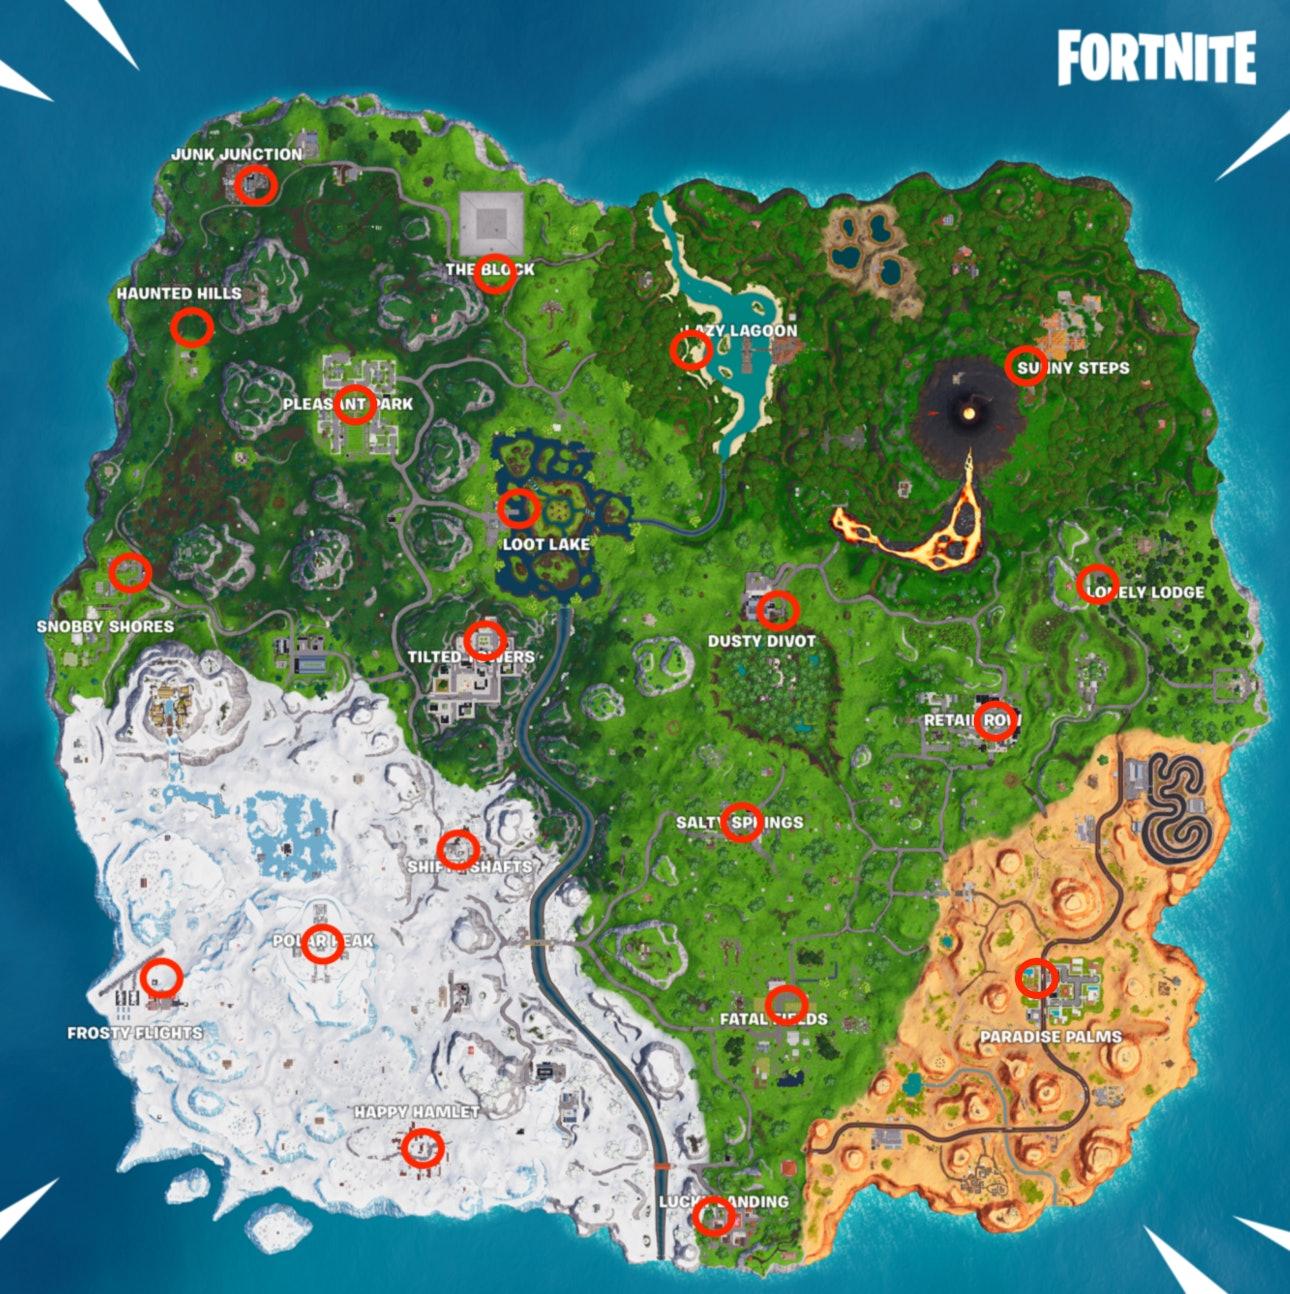 Fortnite Reboot Van Locations Map